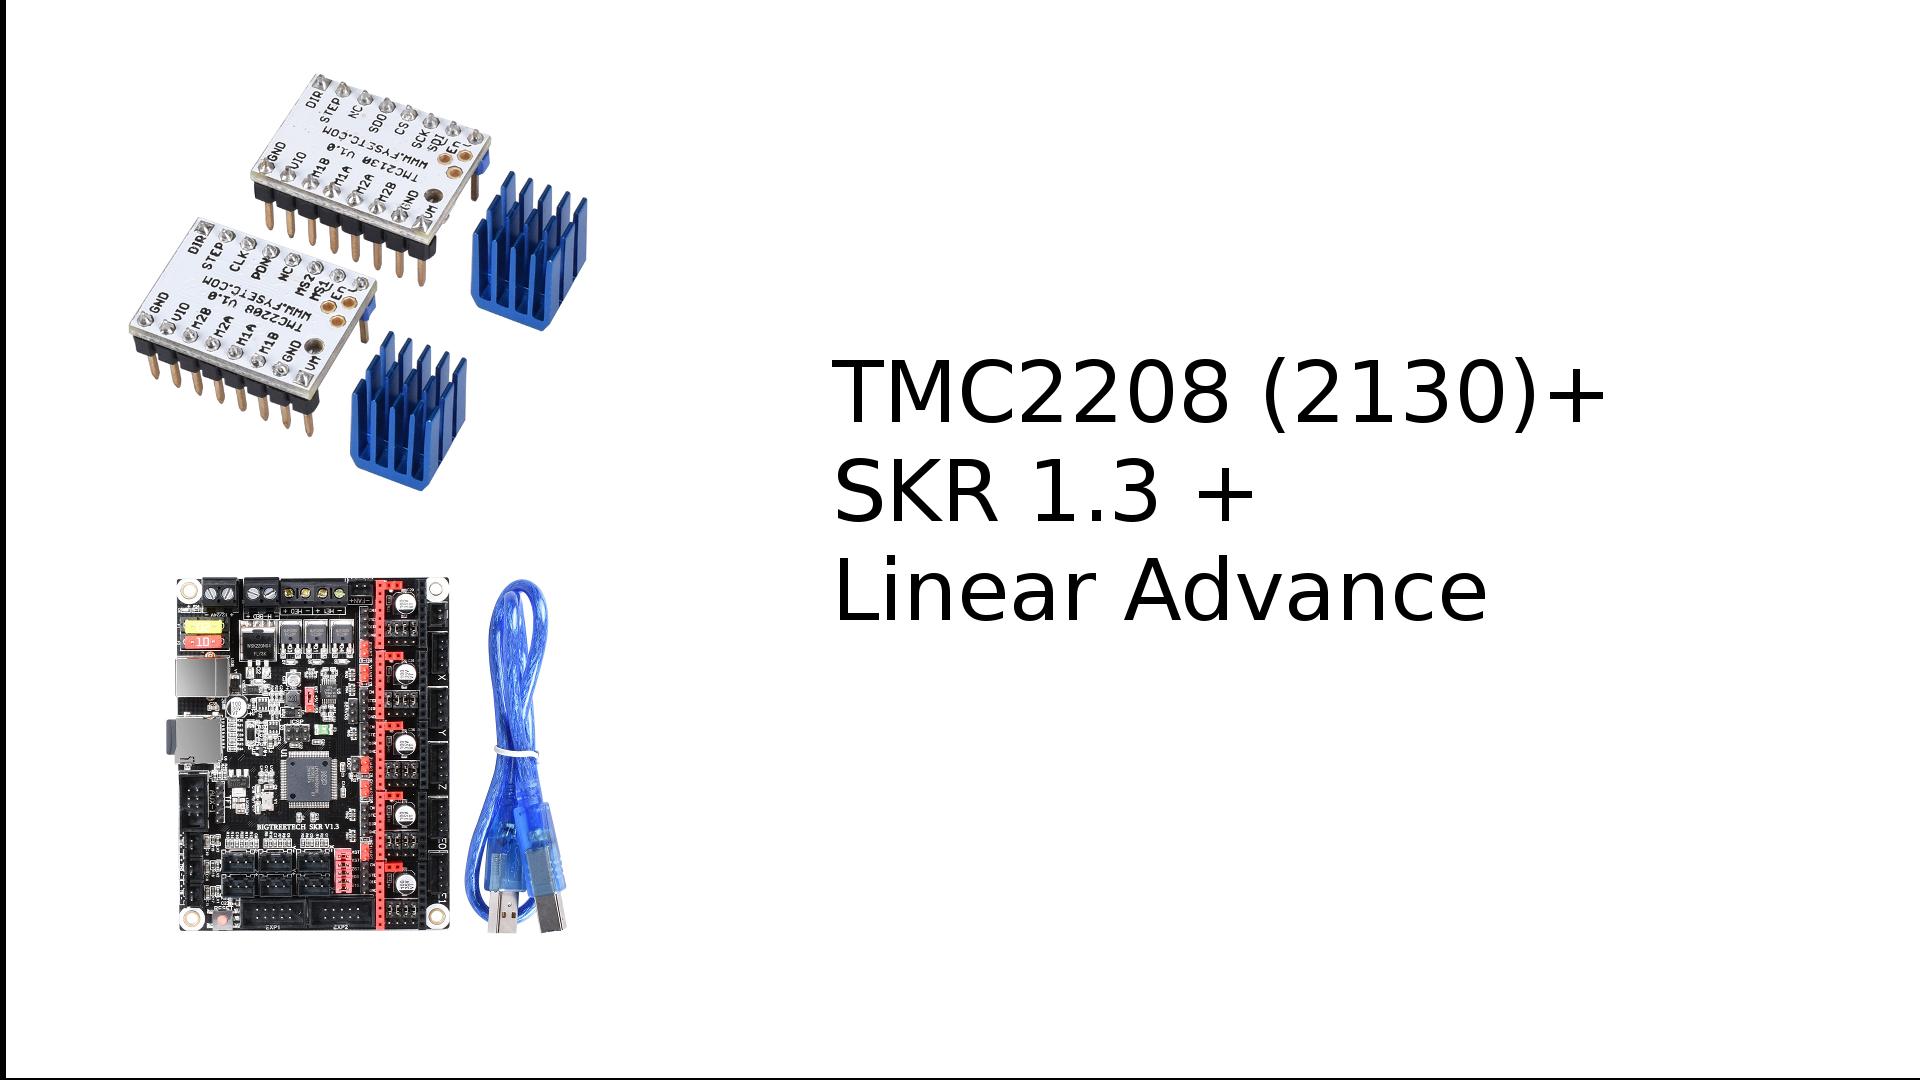 Linear Advance + SKR 1 3 + TMC2208 (2130)